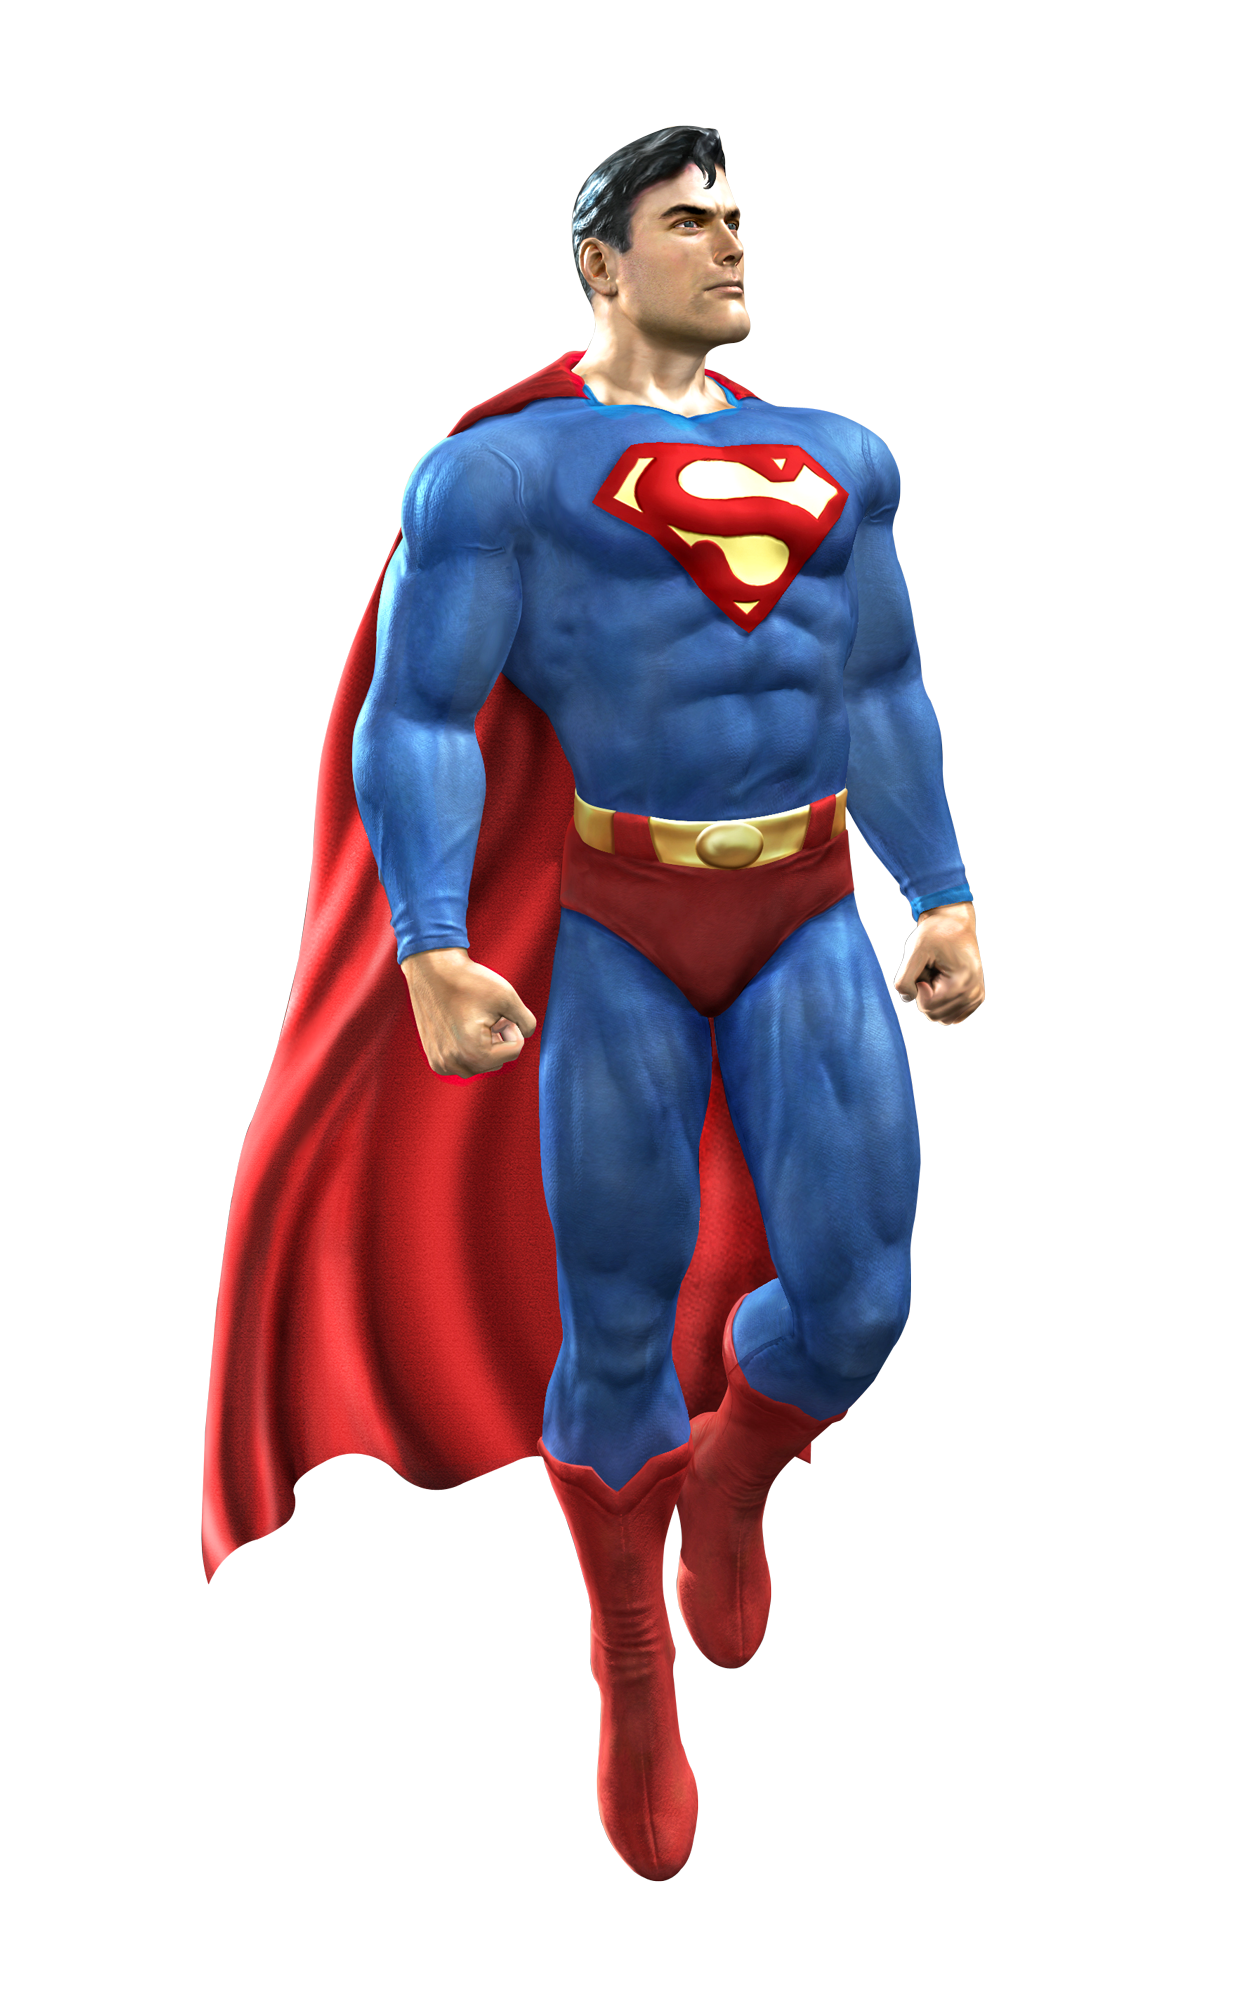 Superman PNG Transparent Image - Superhero PNG